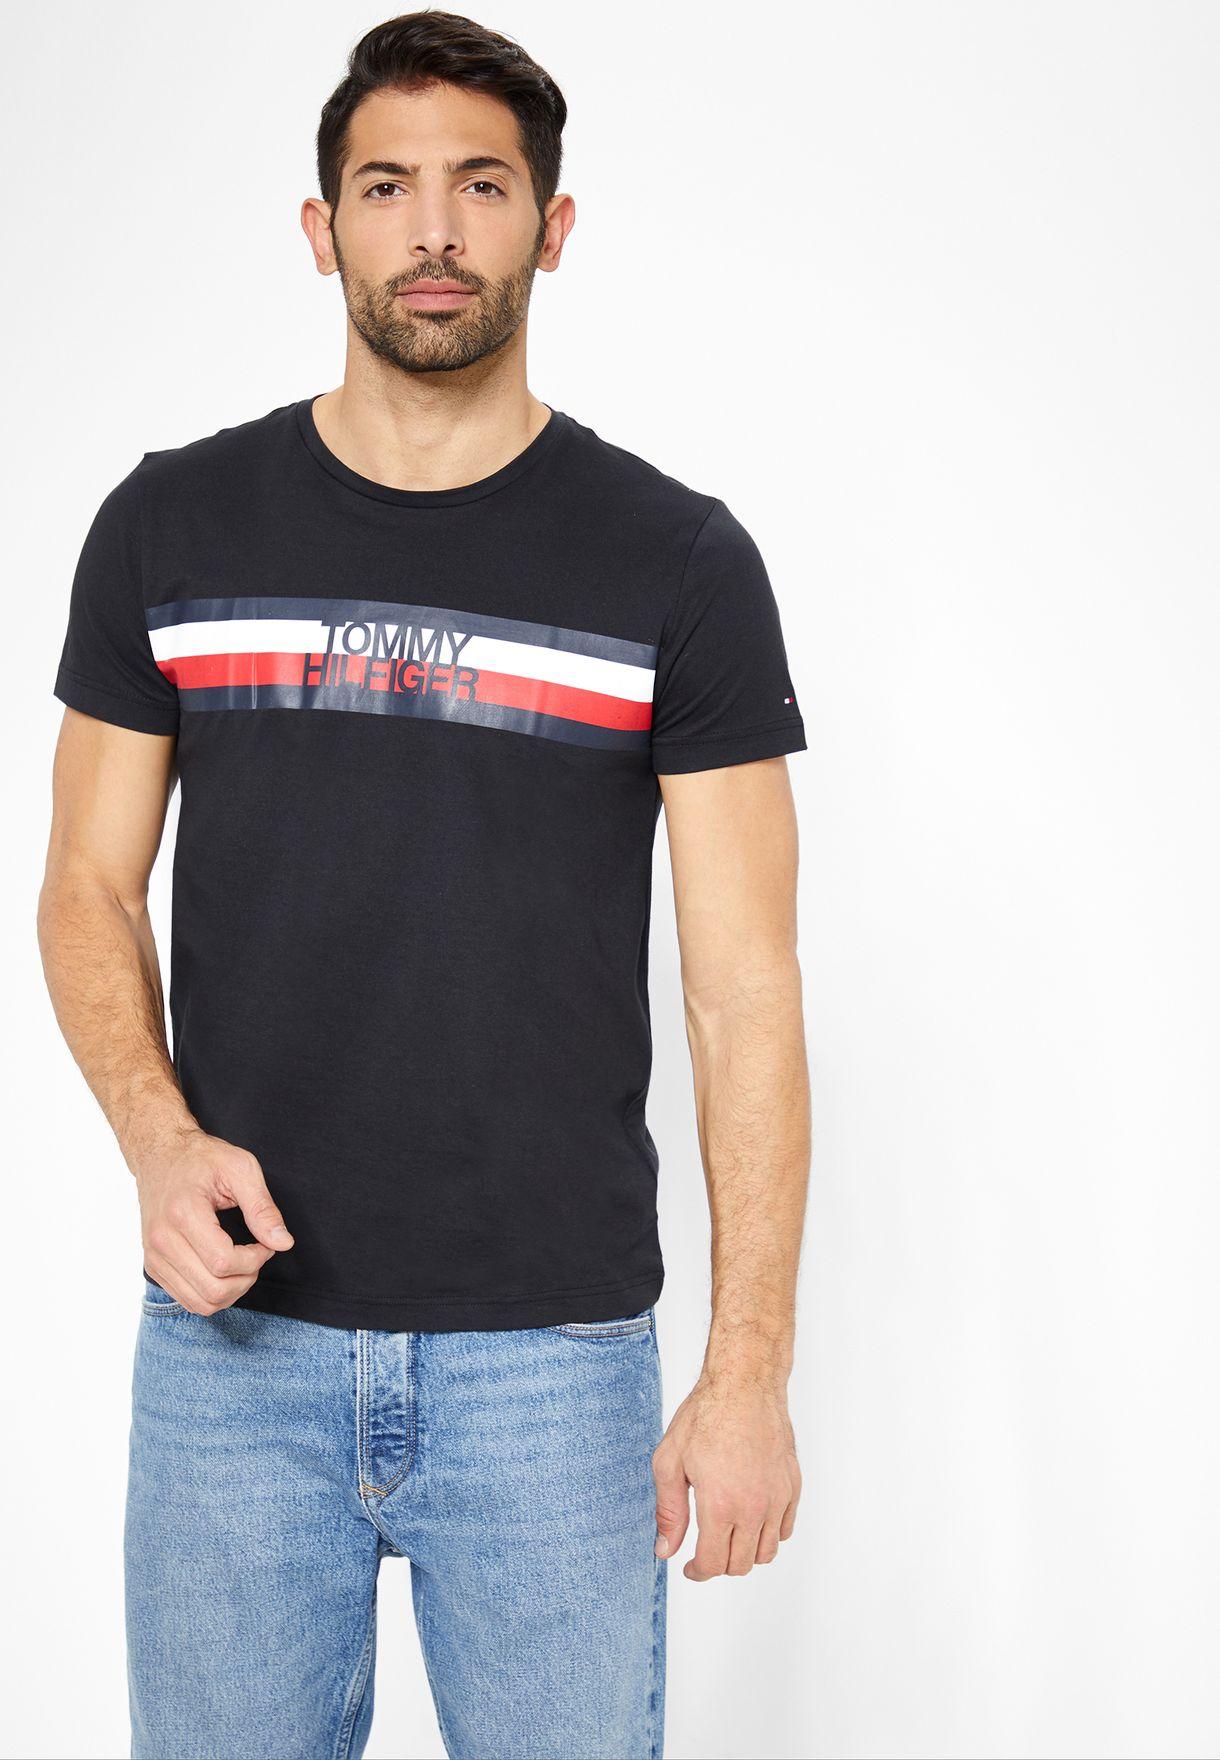 955a4a53 Shop Tommy Hilfiger black Crew Neck Logo Crew Neck T-Shirt ...